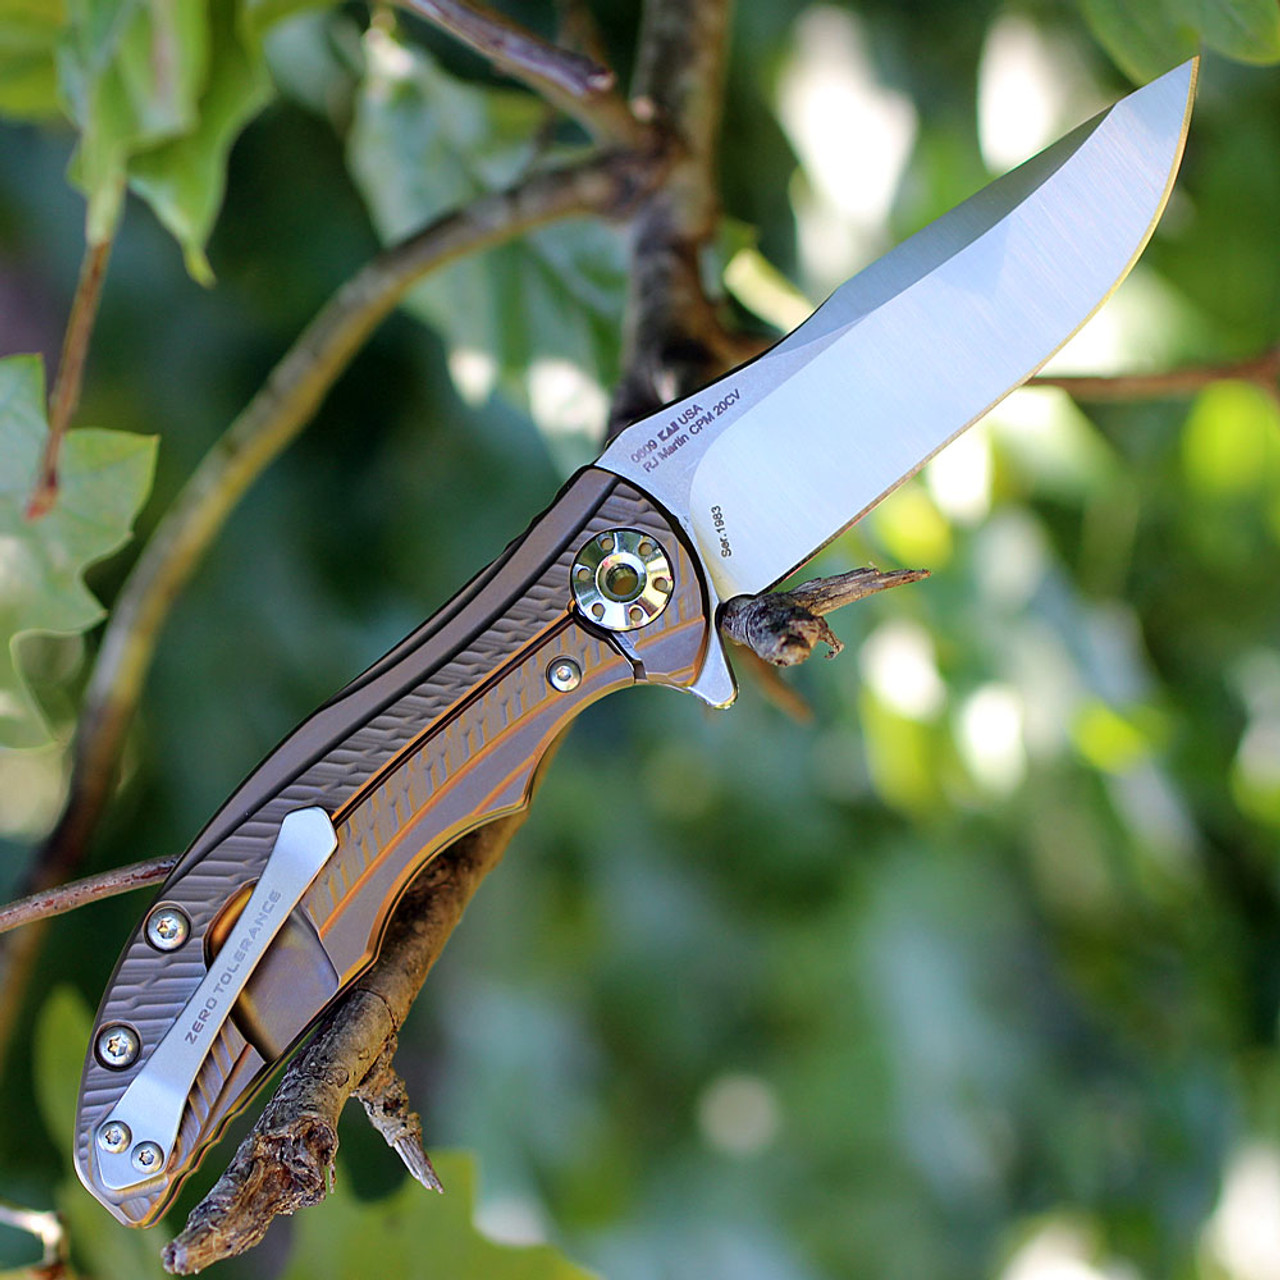 Zero Tolerance 0609 RJ & Matt Martin, 3.4 in CPM 20CV Plain Blade, Bronze Ti Anodized Handle